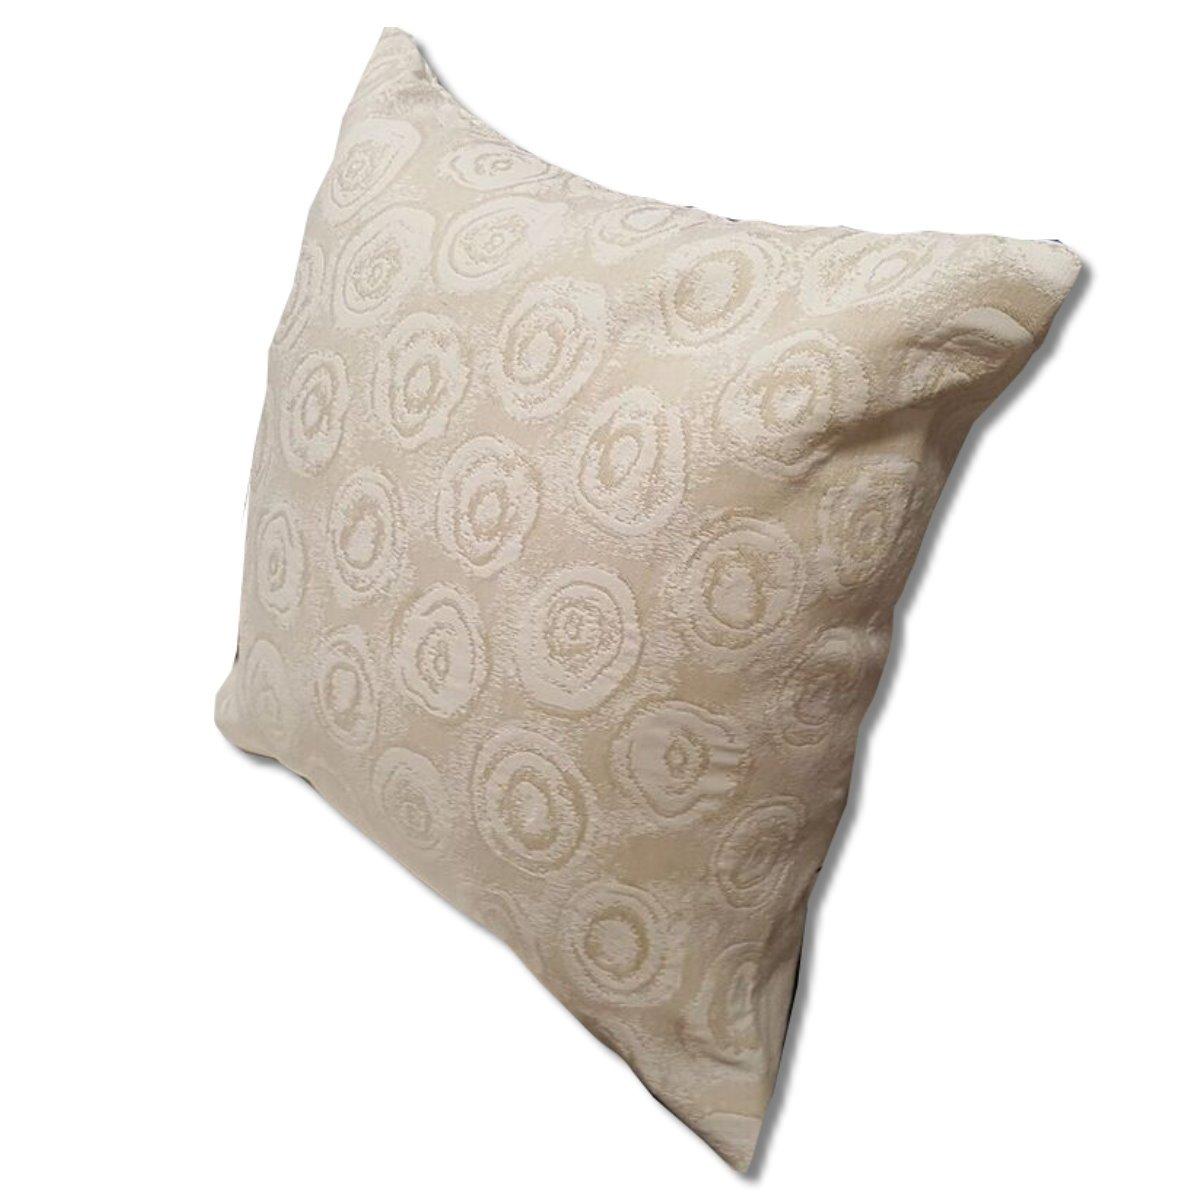 Vendita di biancheria per la casa cuscini arredo o fodere for Federe cuscini arredo